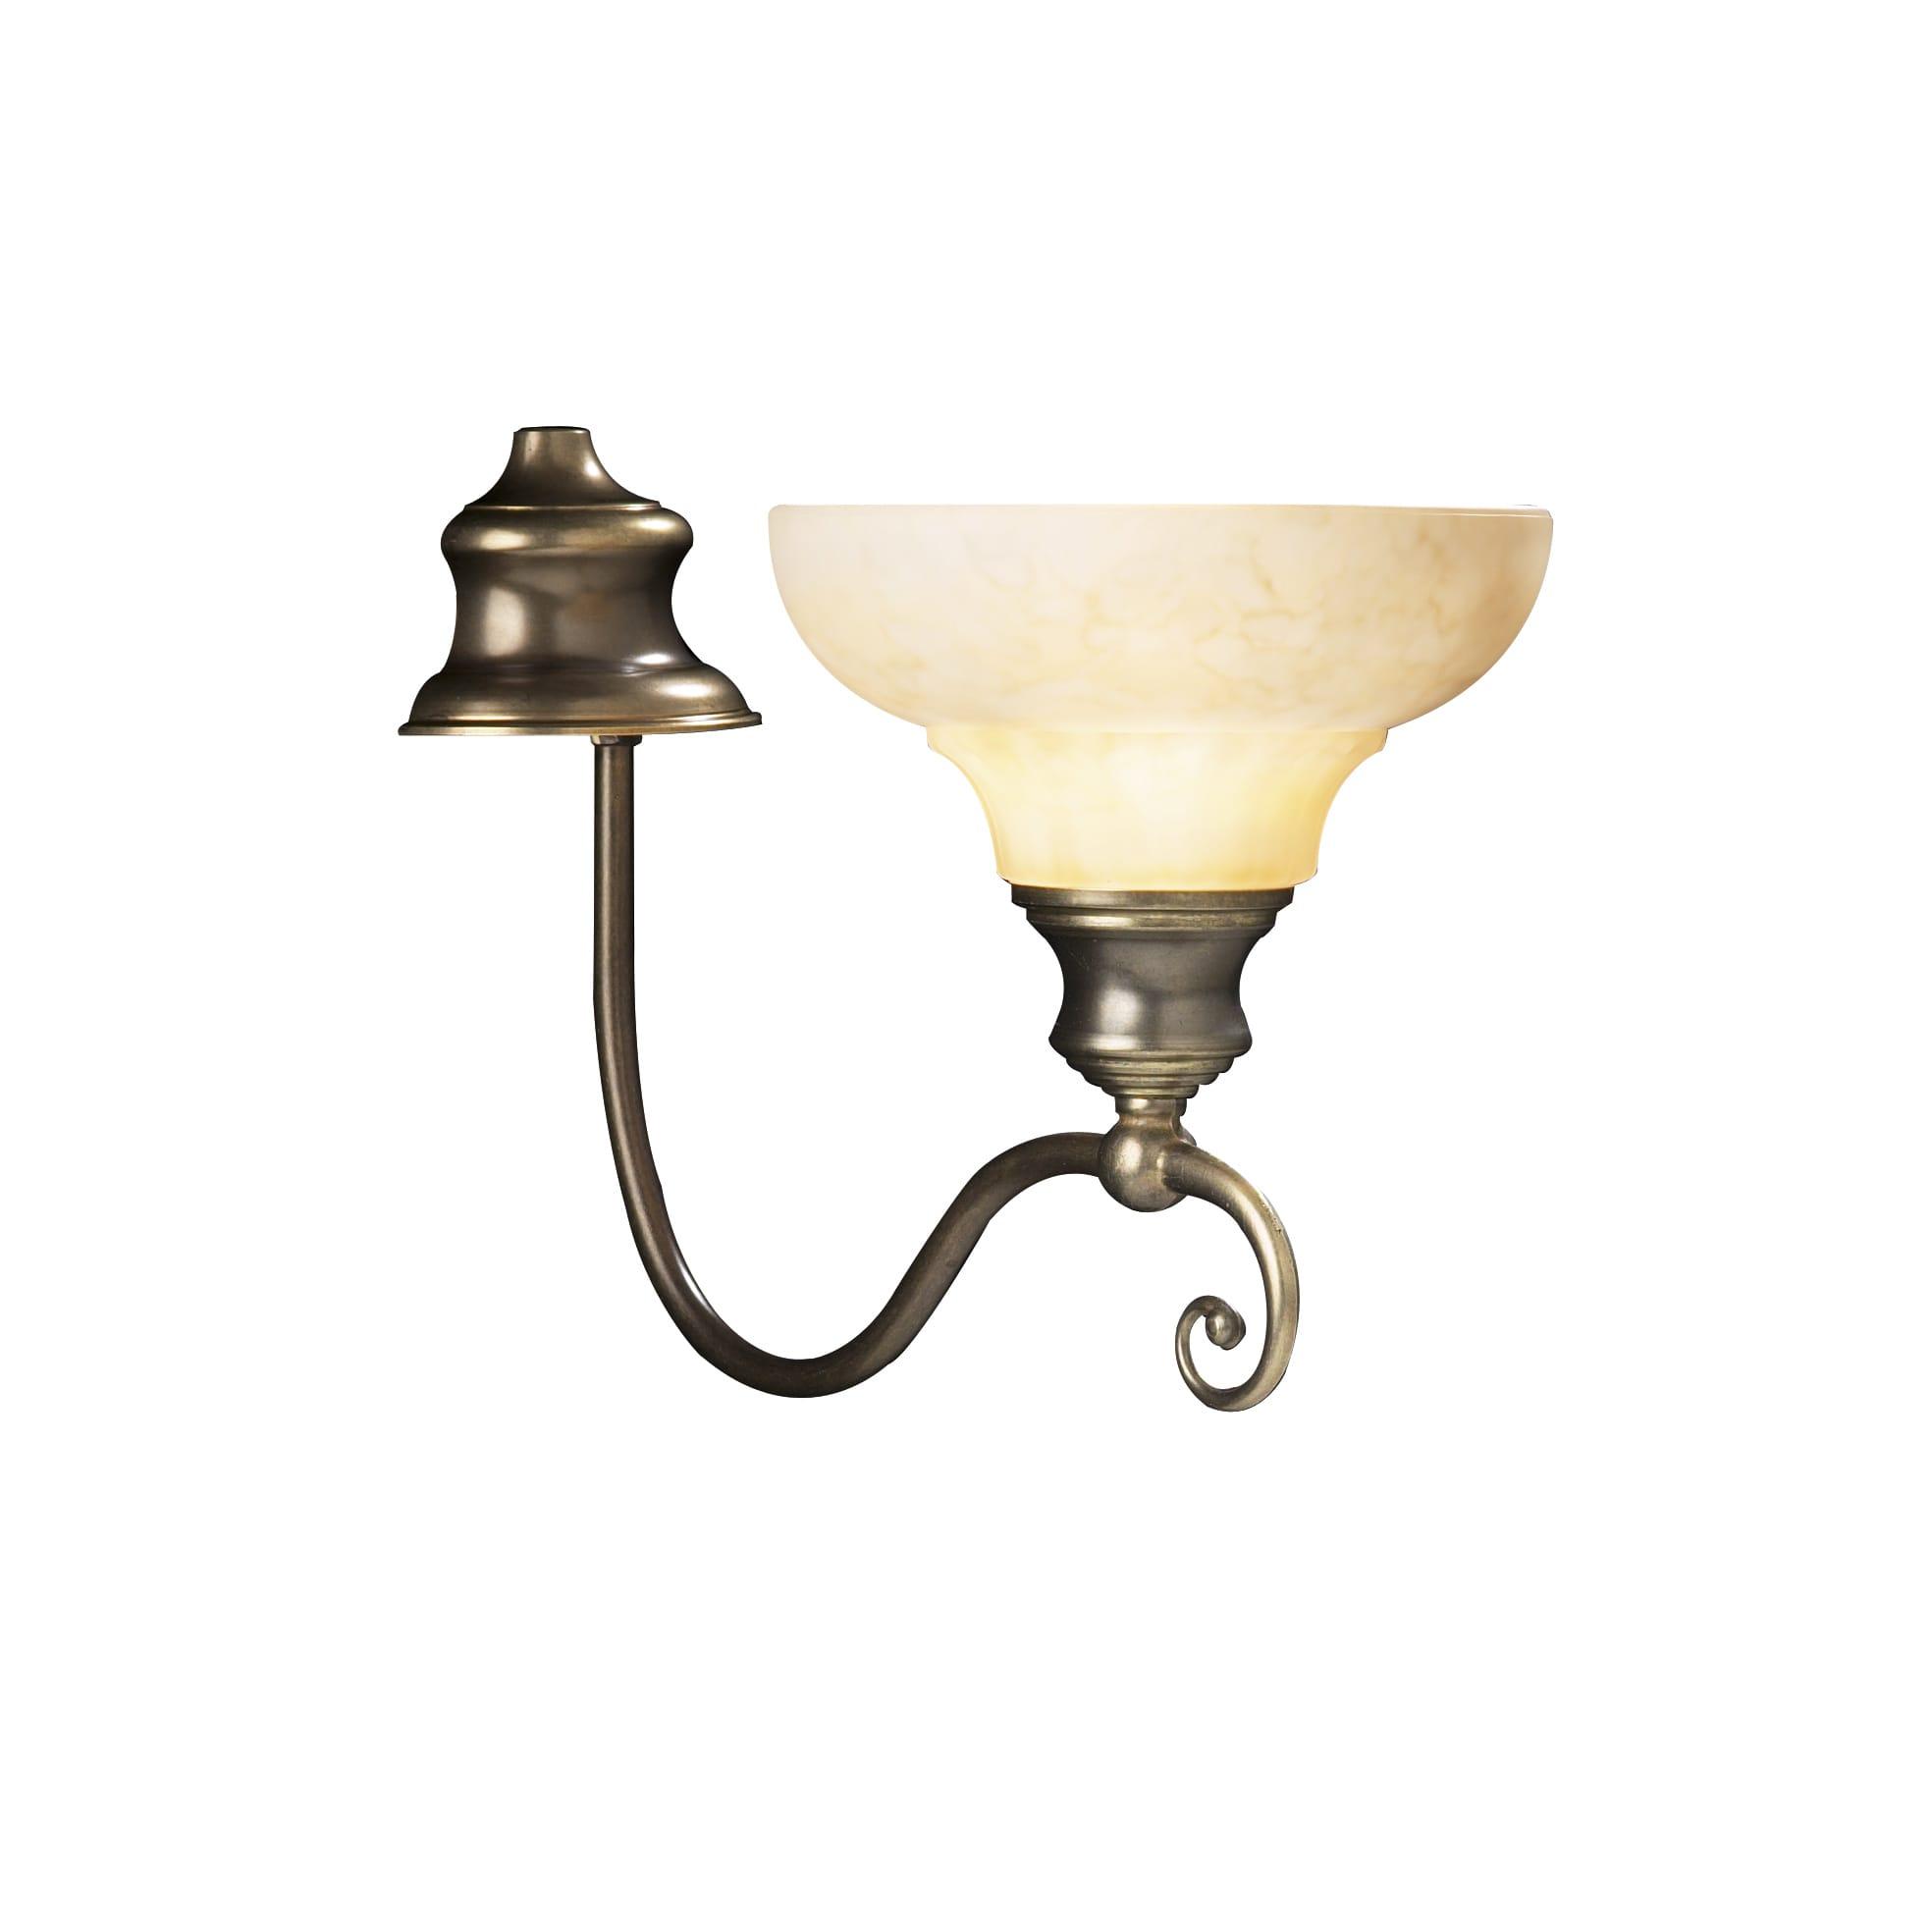 Wall light aged brass bracket and cream glass shade